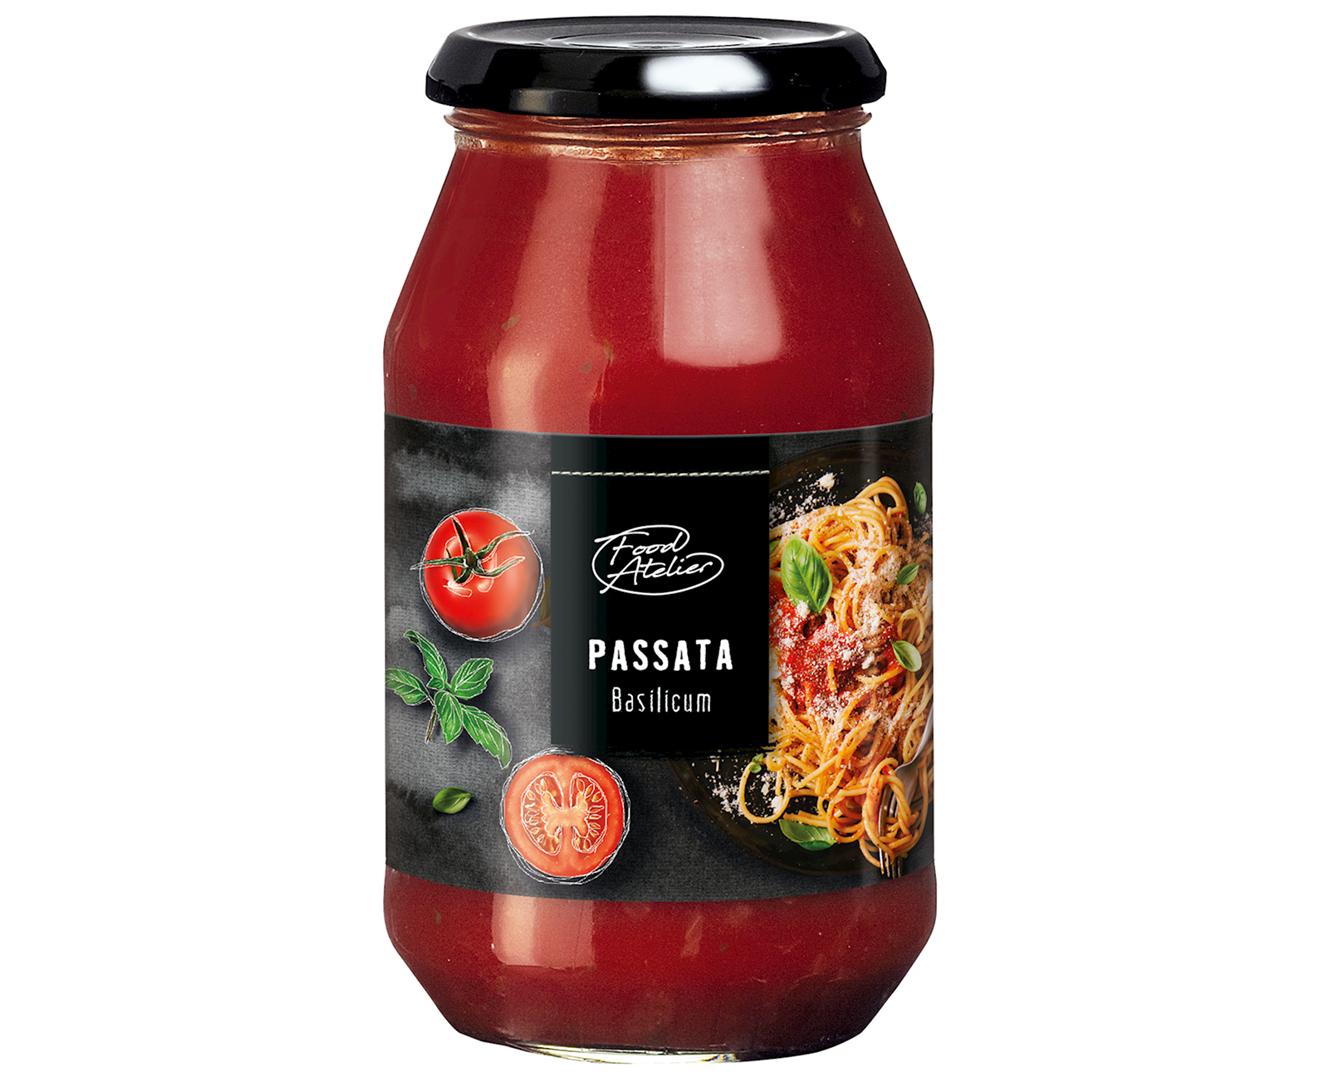 Productafbeelding Pastasaus Food atelier 520g pot